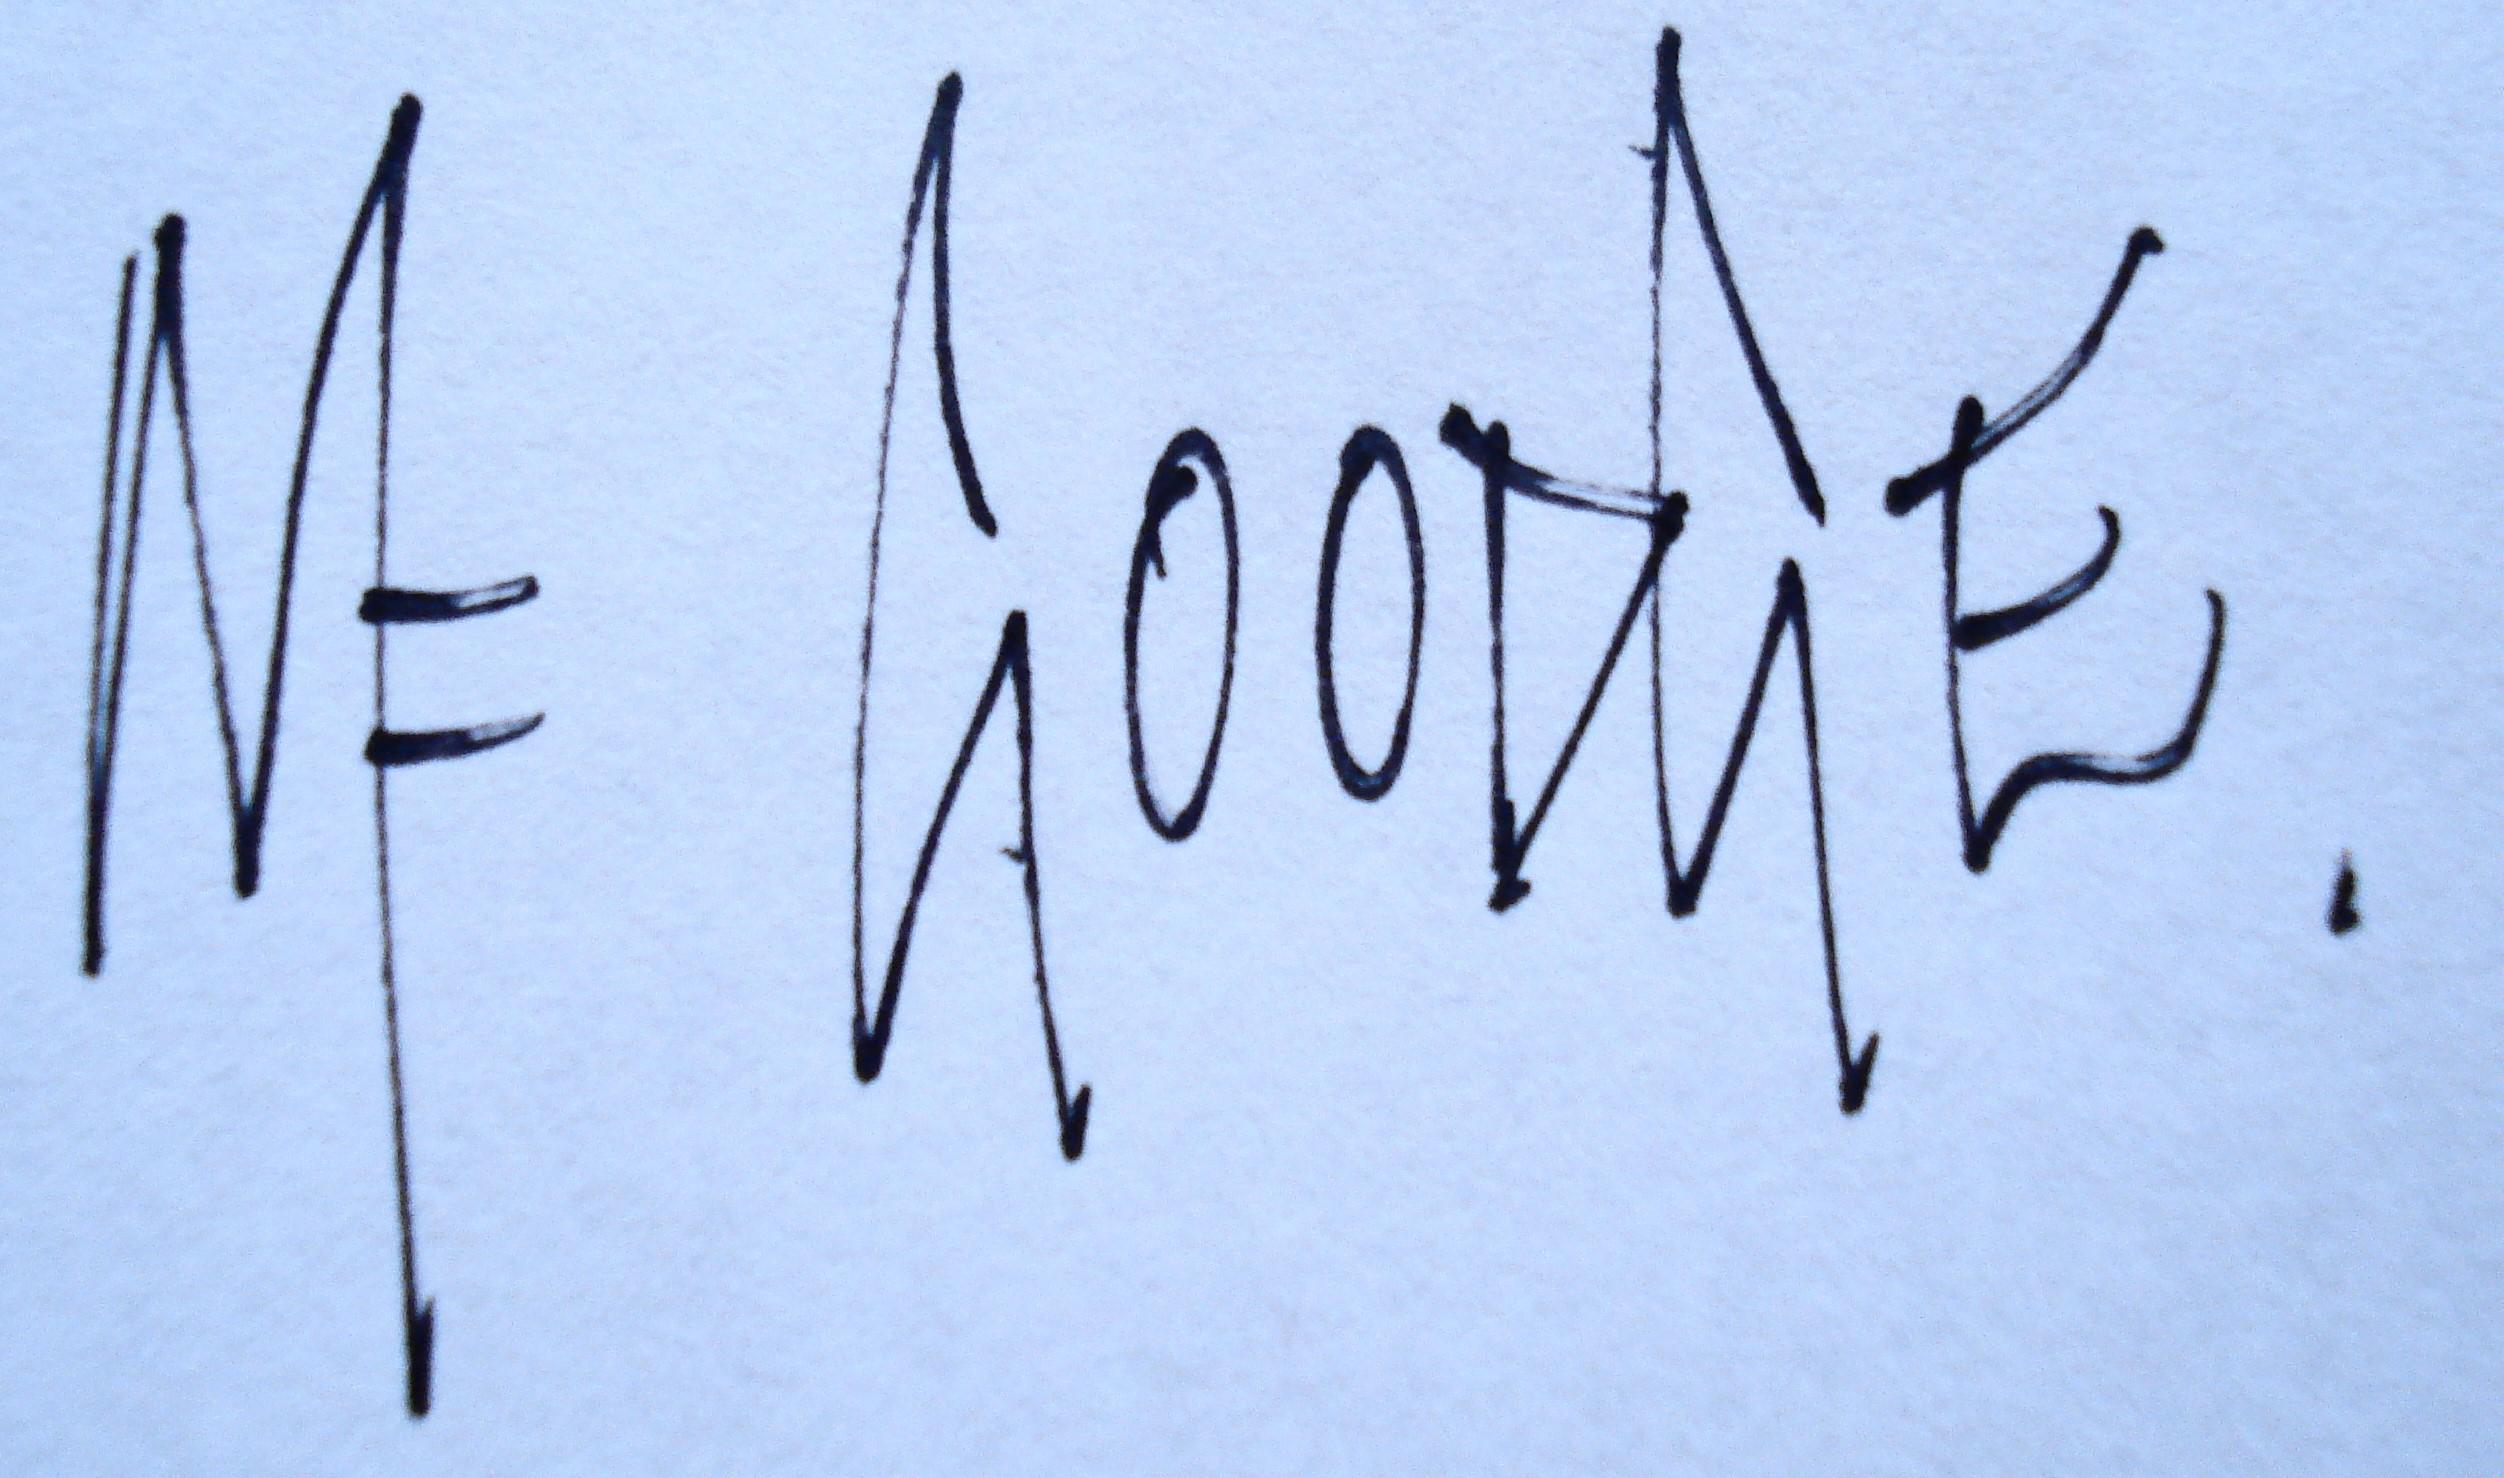 Mike Goodge's Signature